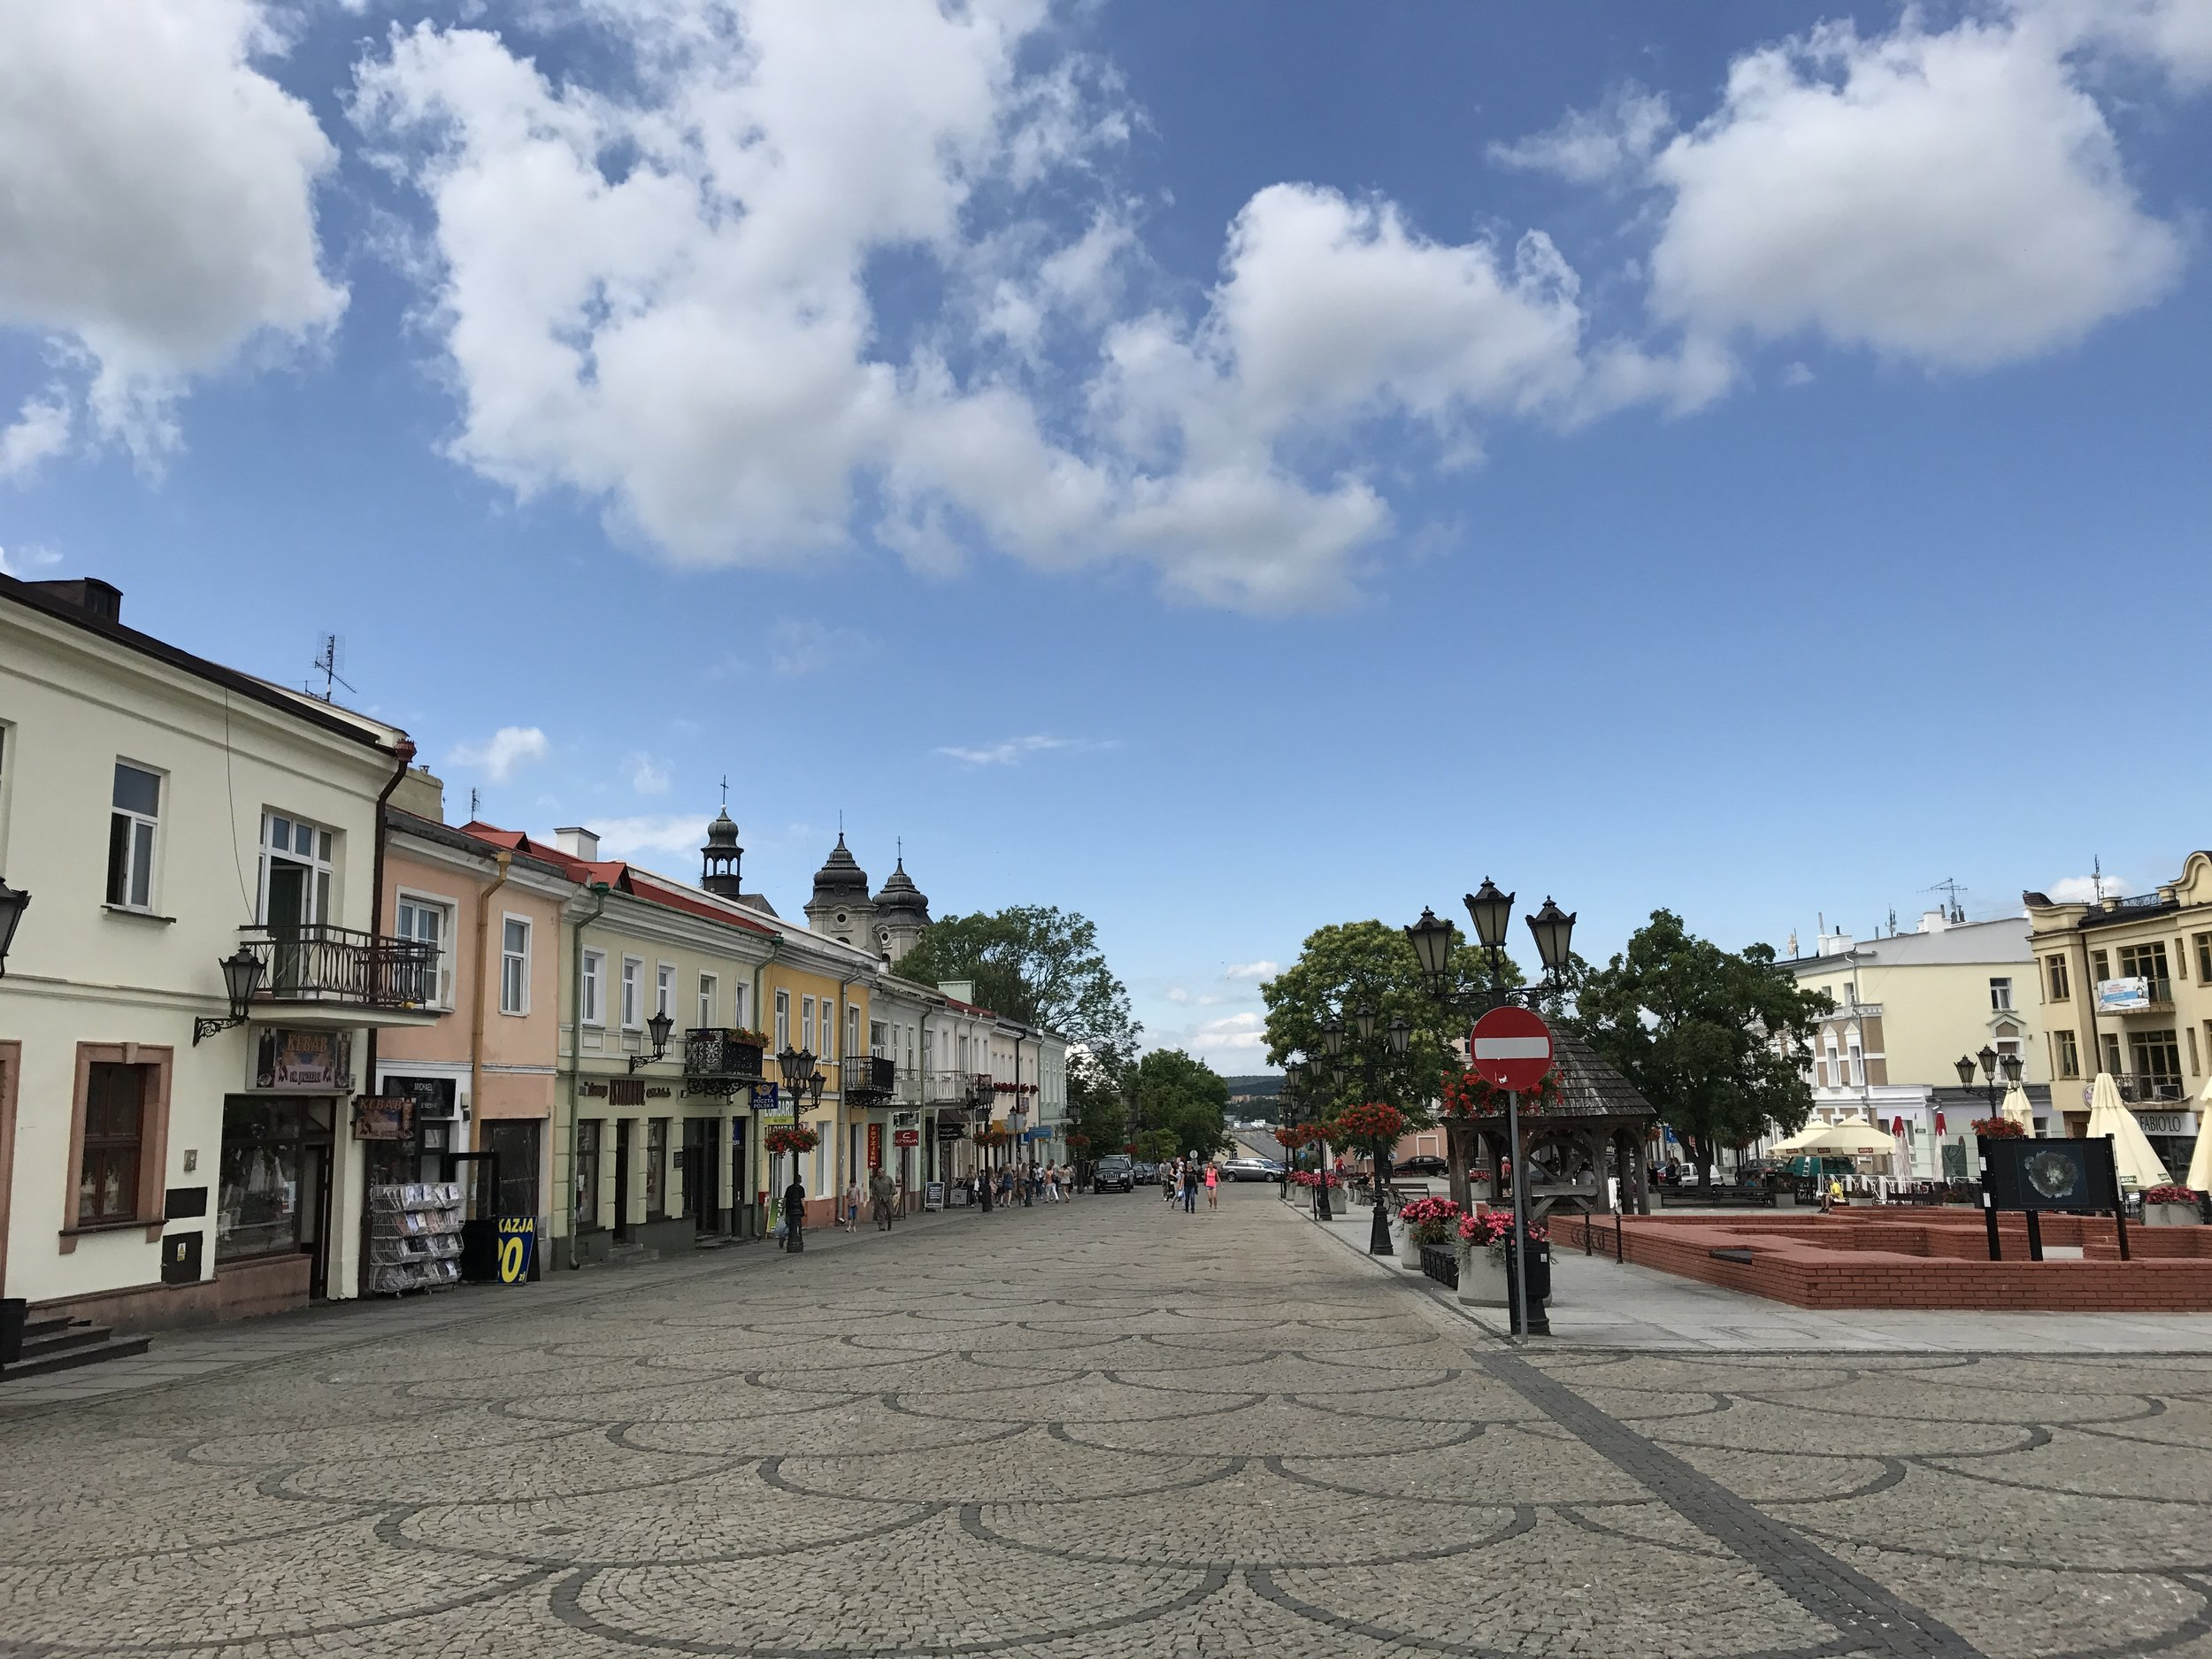 Main Street in Chelm, Poland